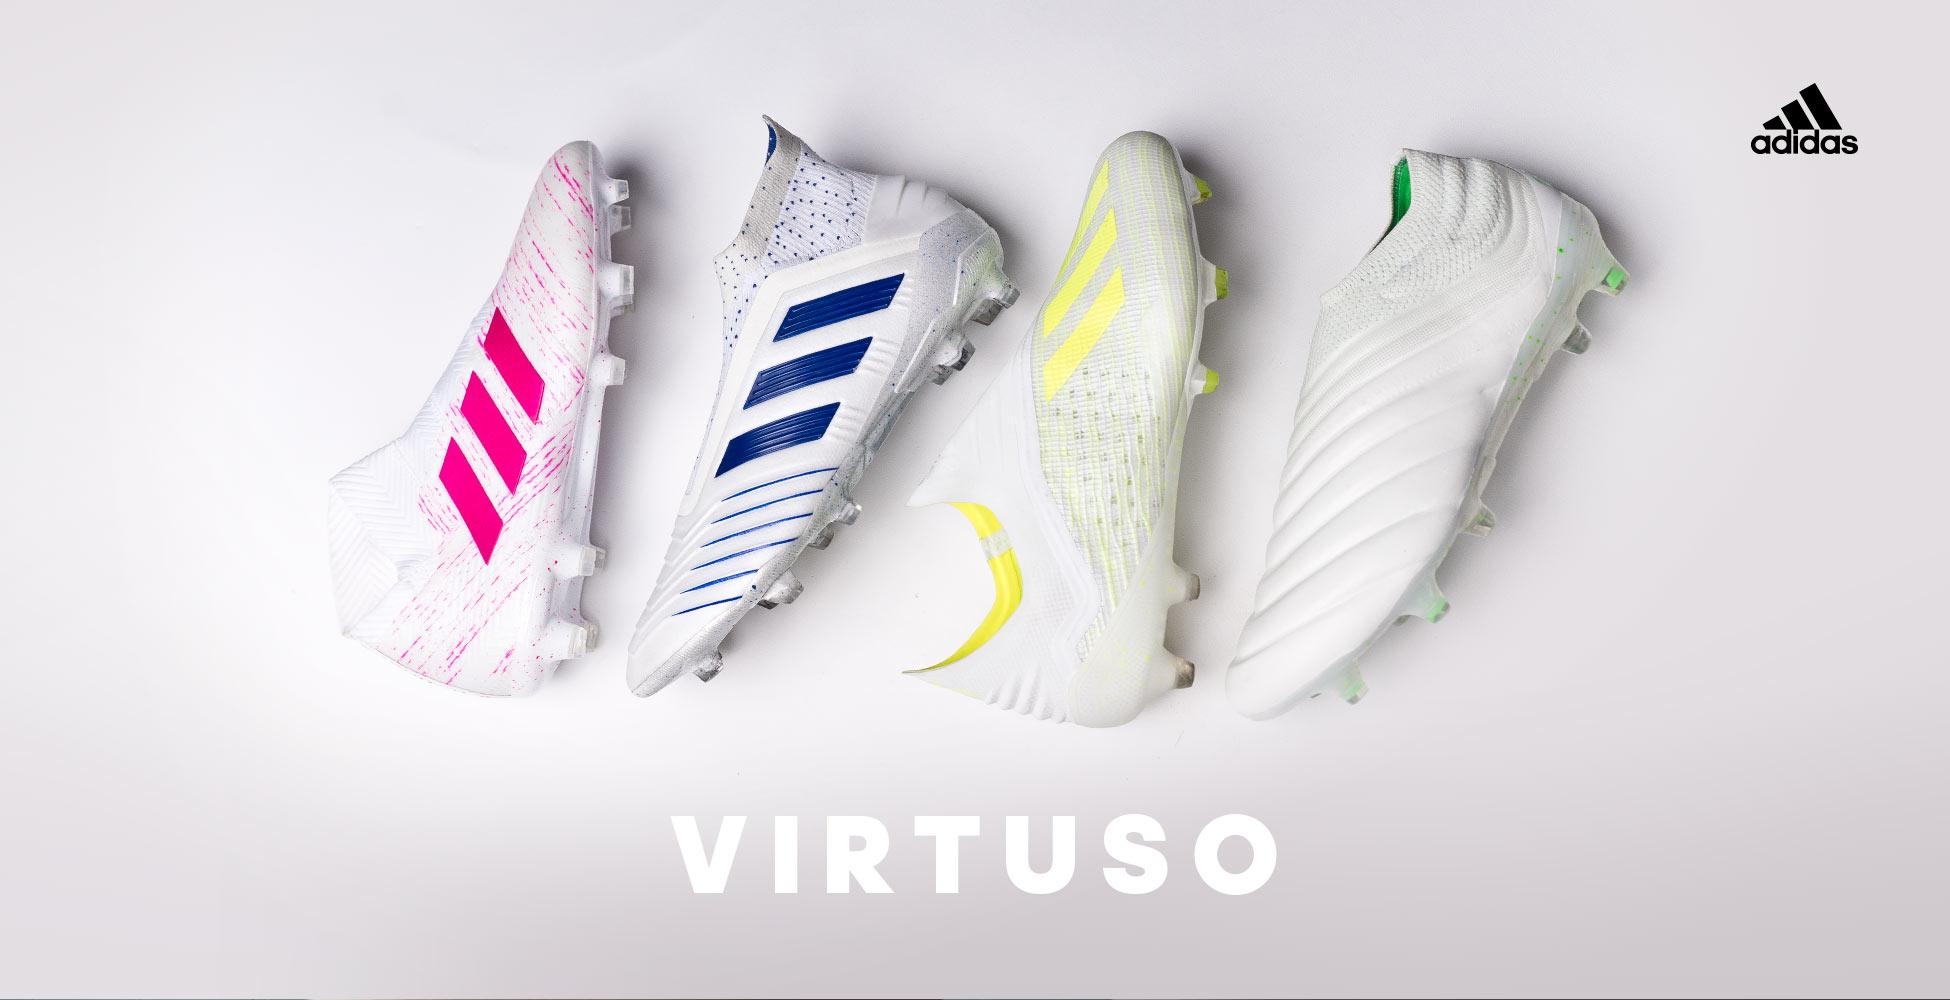 adidas Virtuso Negozio di calcio Fútbol Emotion